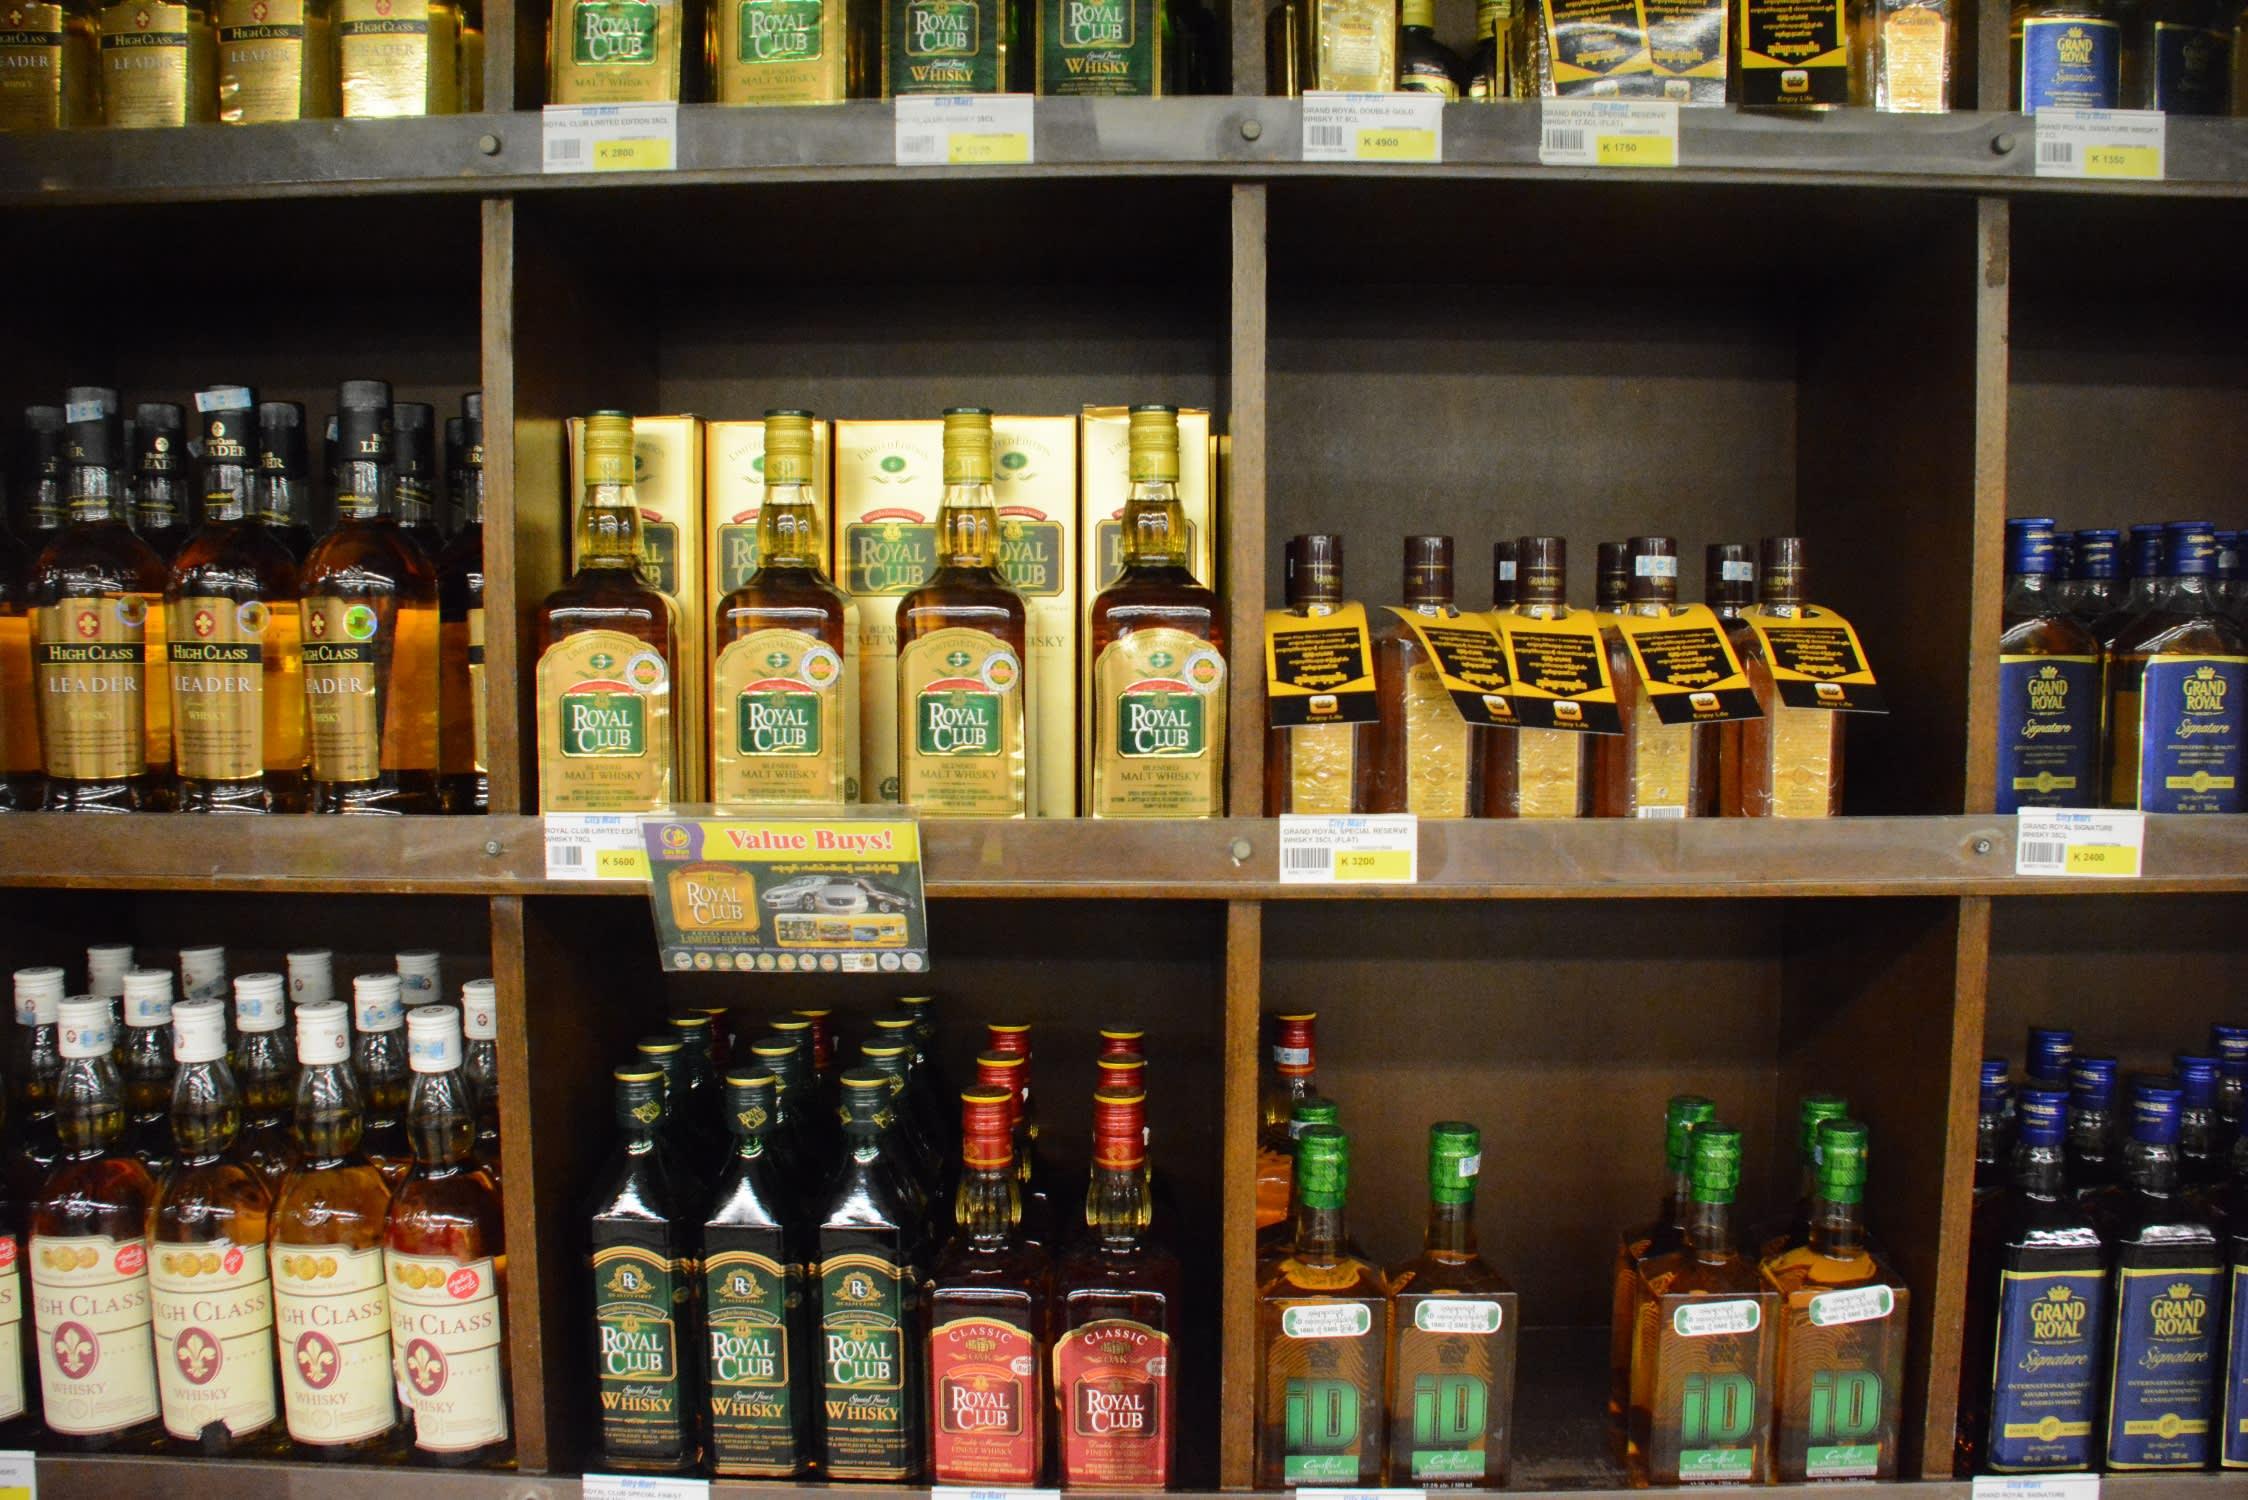 Whisky making in Myanmar: Yoma brings in Pernod Ricard - Nikkei